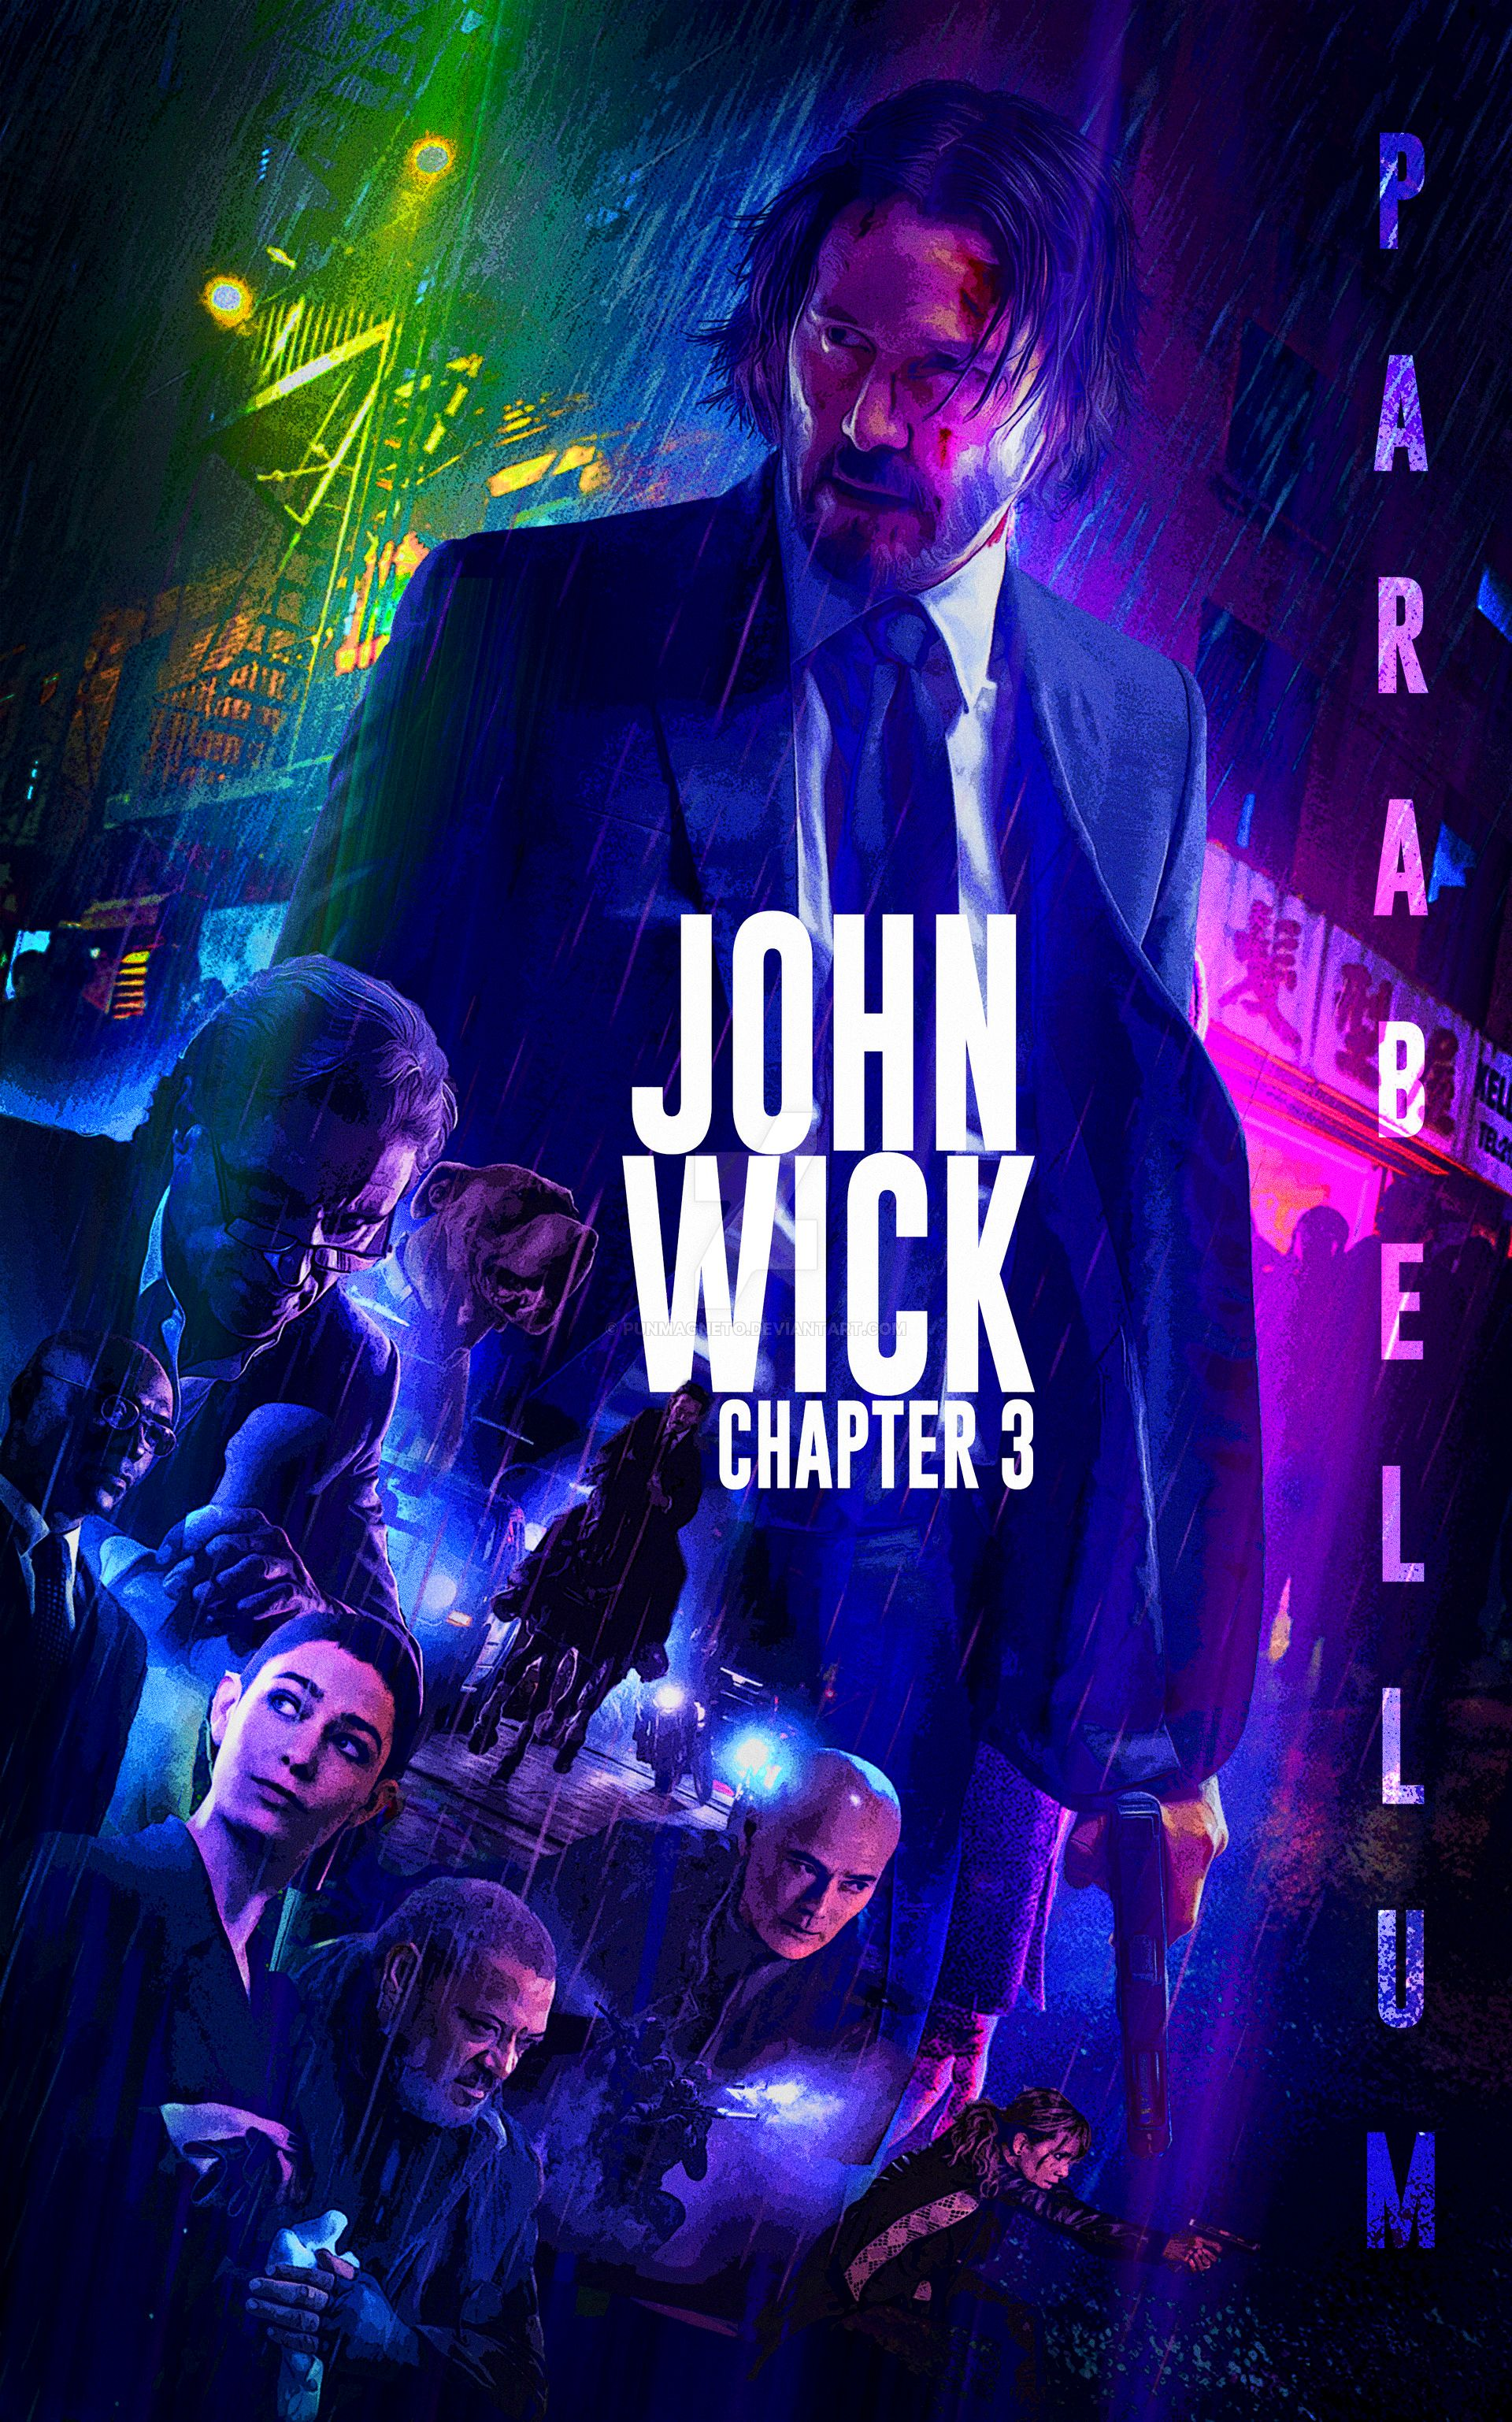 Pin By Twan Smith On Futuristicjapanesescifi John Wick Keanu Reeves John Wick Movie